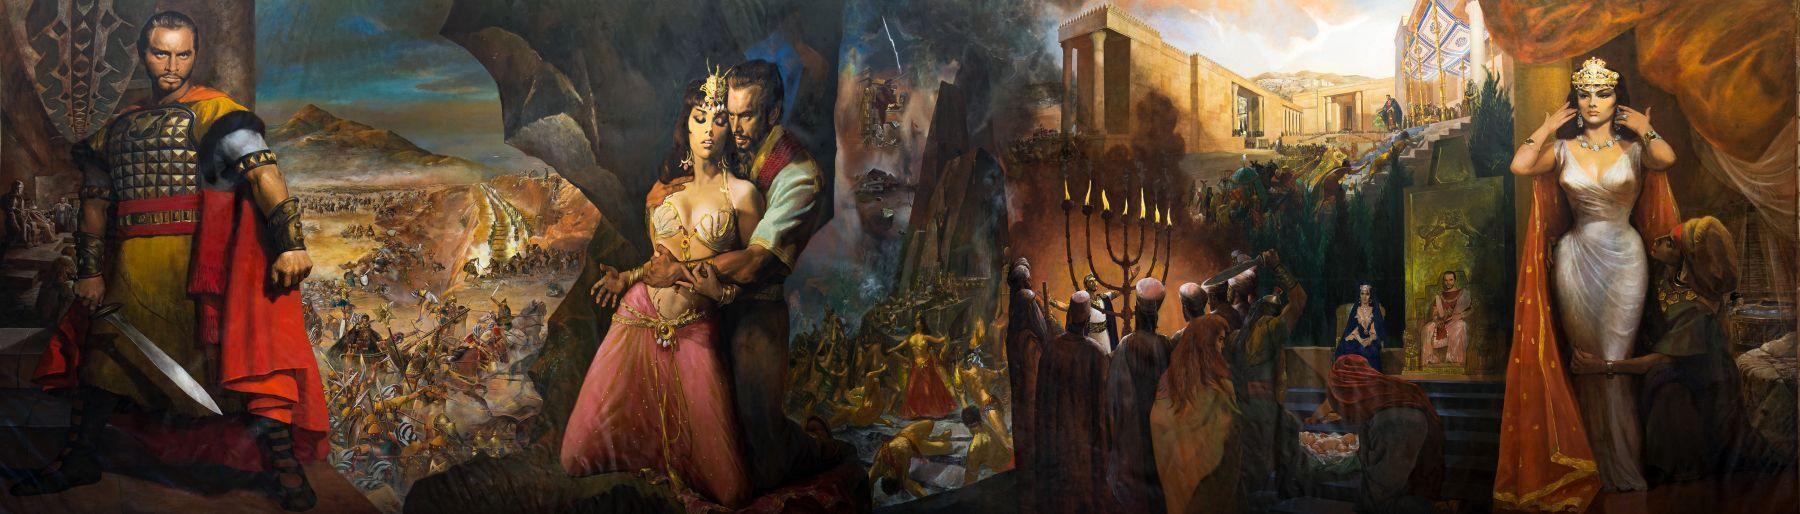 Solomon & Sheba by Symeon Shimin